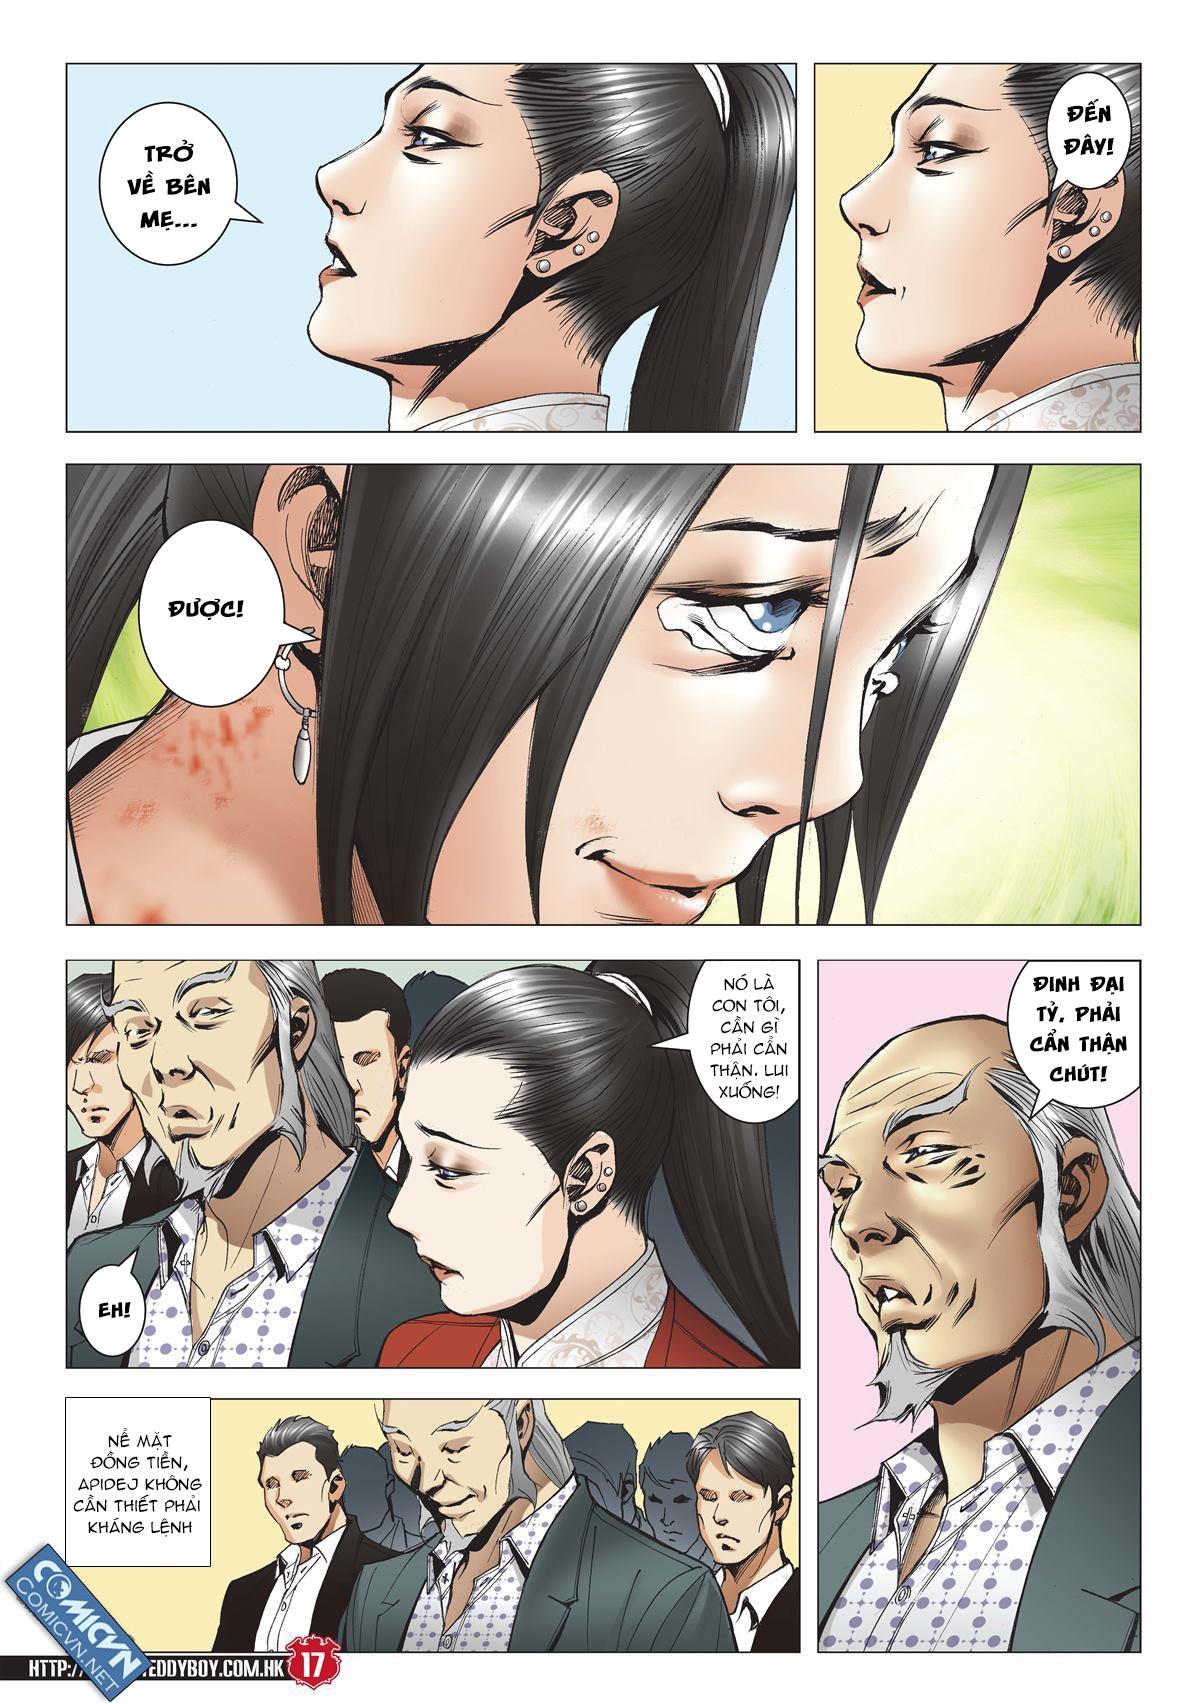 Người Trong Giang Hồ chapter 2001: tự tận trang 16